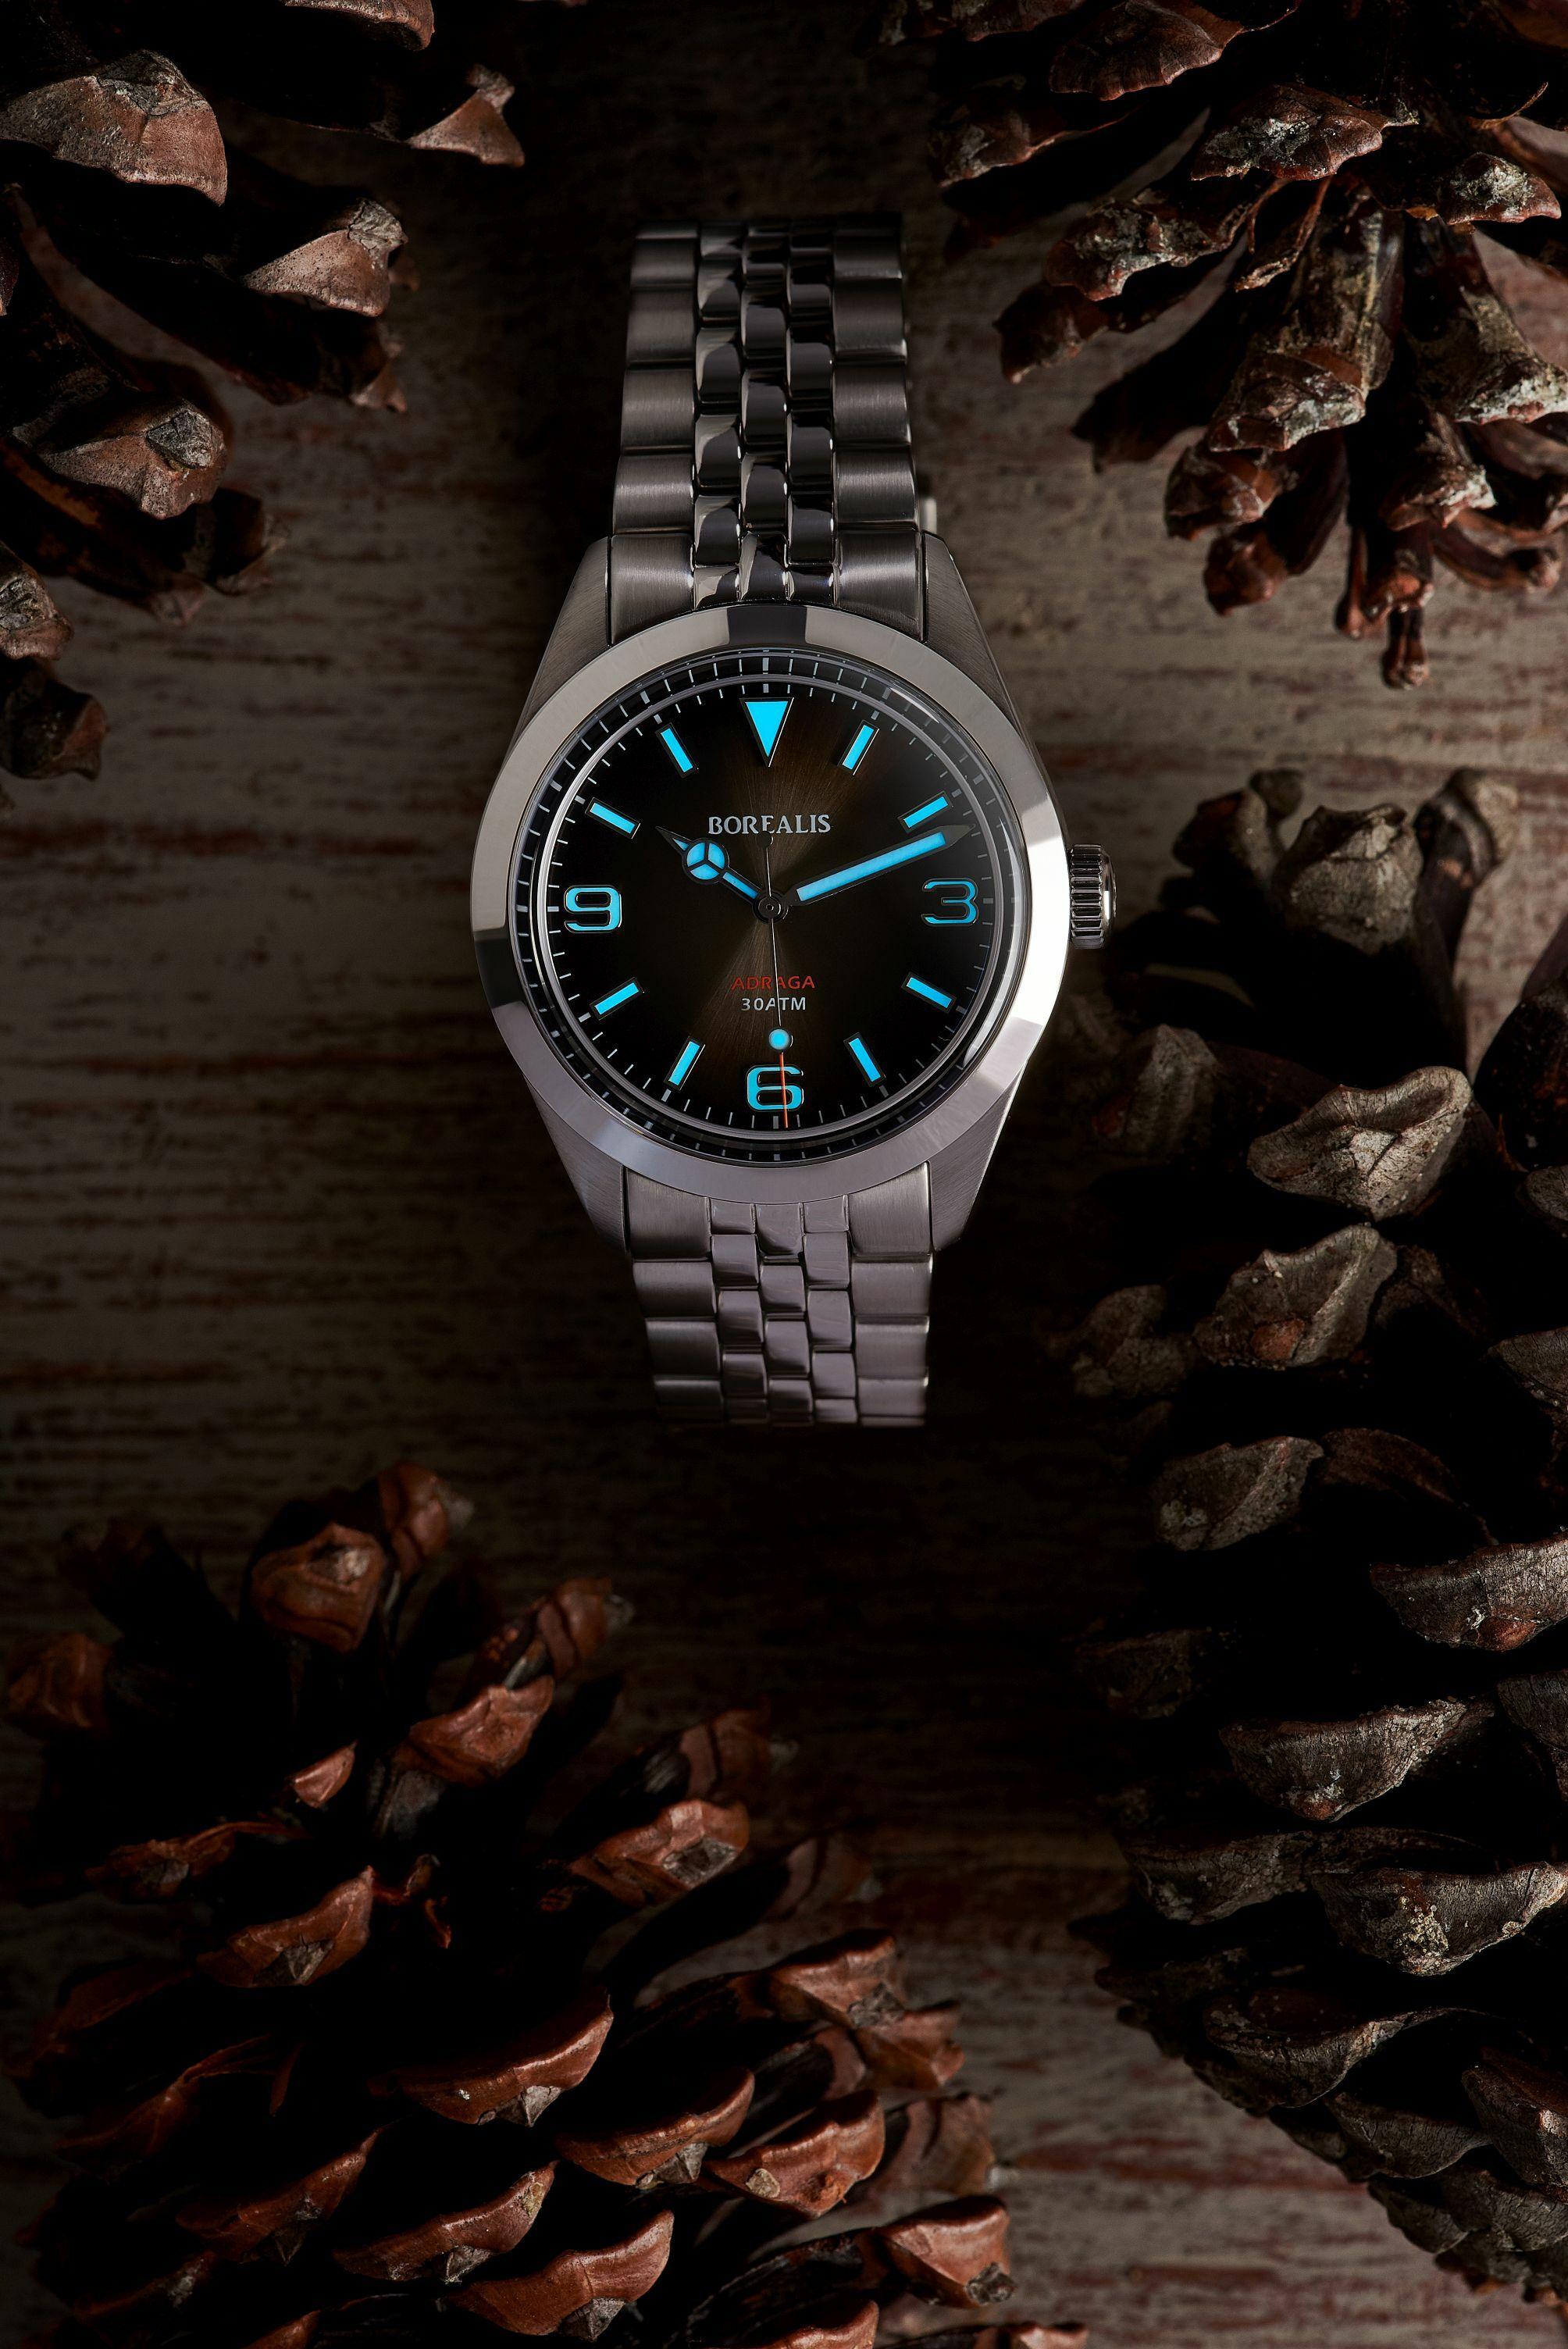 Borealis Adraga Stainless Steel Miyota 9015 fumed brown dial Mercedes Hands No Date BGW9 lume